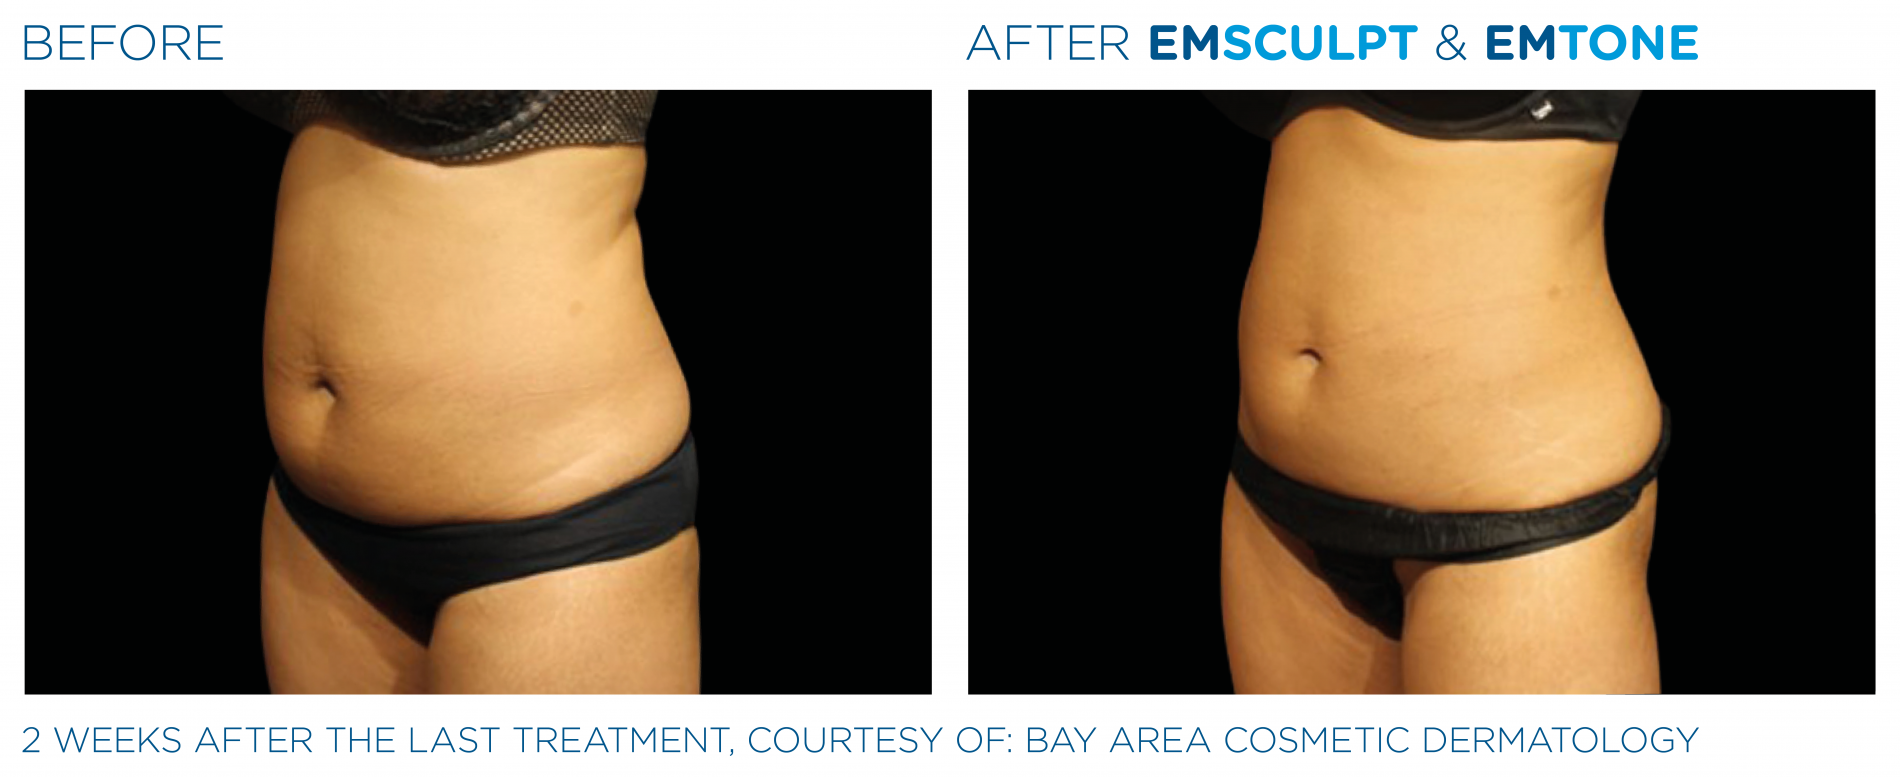 Emsculpt Emtone PIC Ba card female abdomen 001 EN100